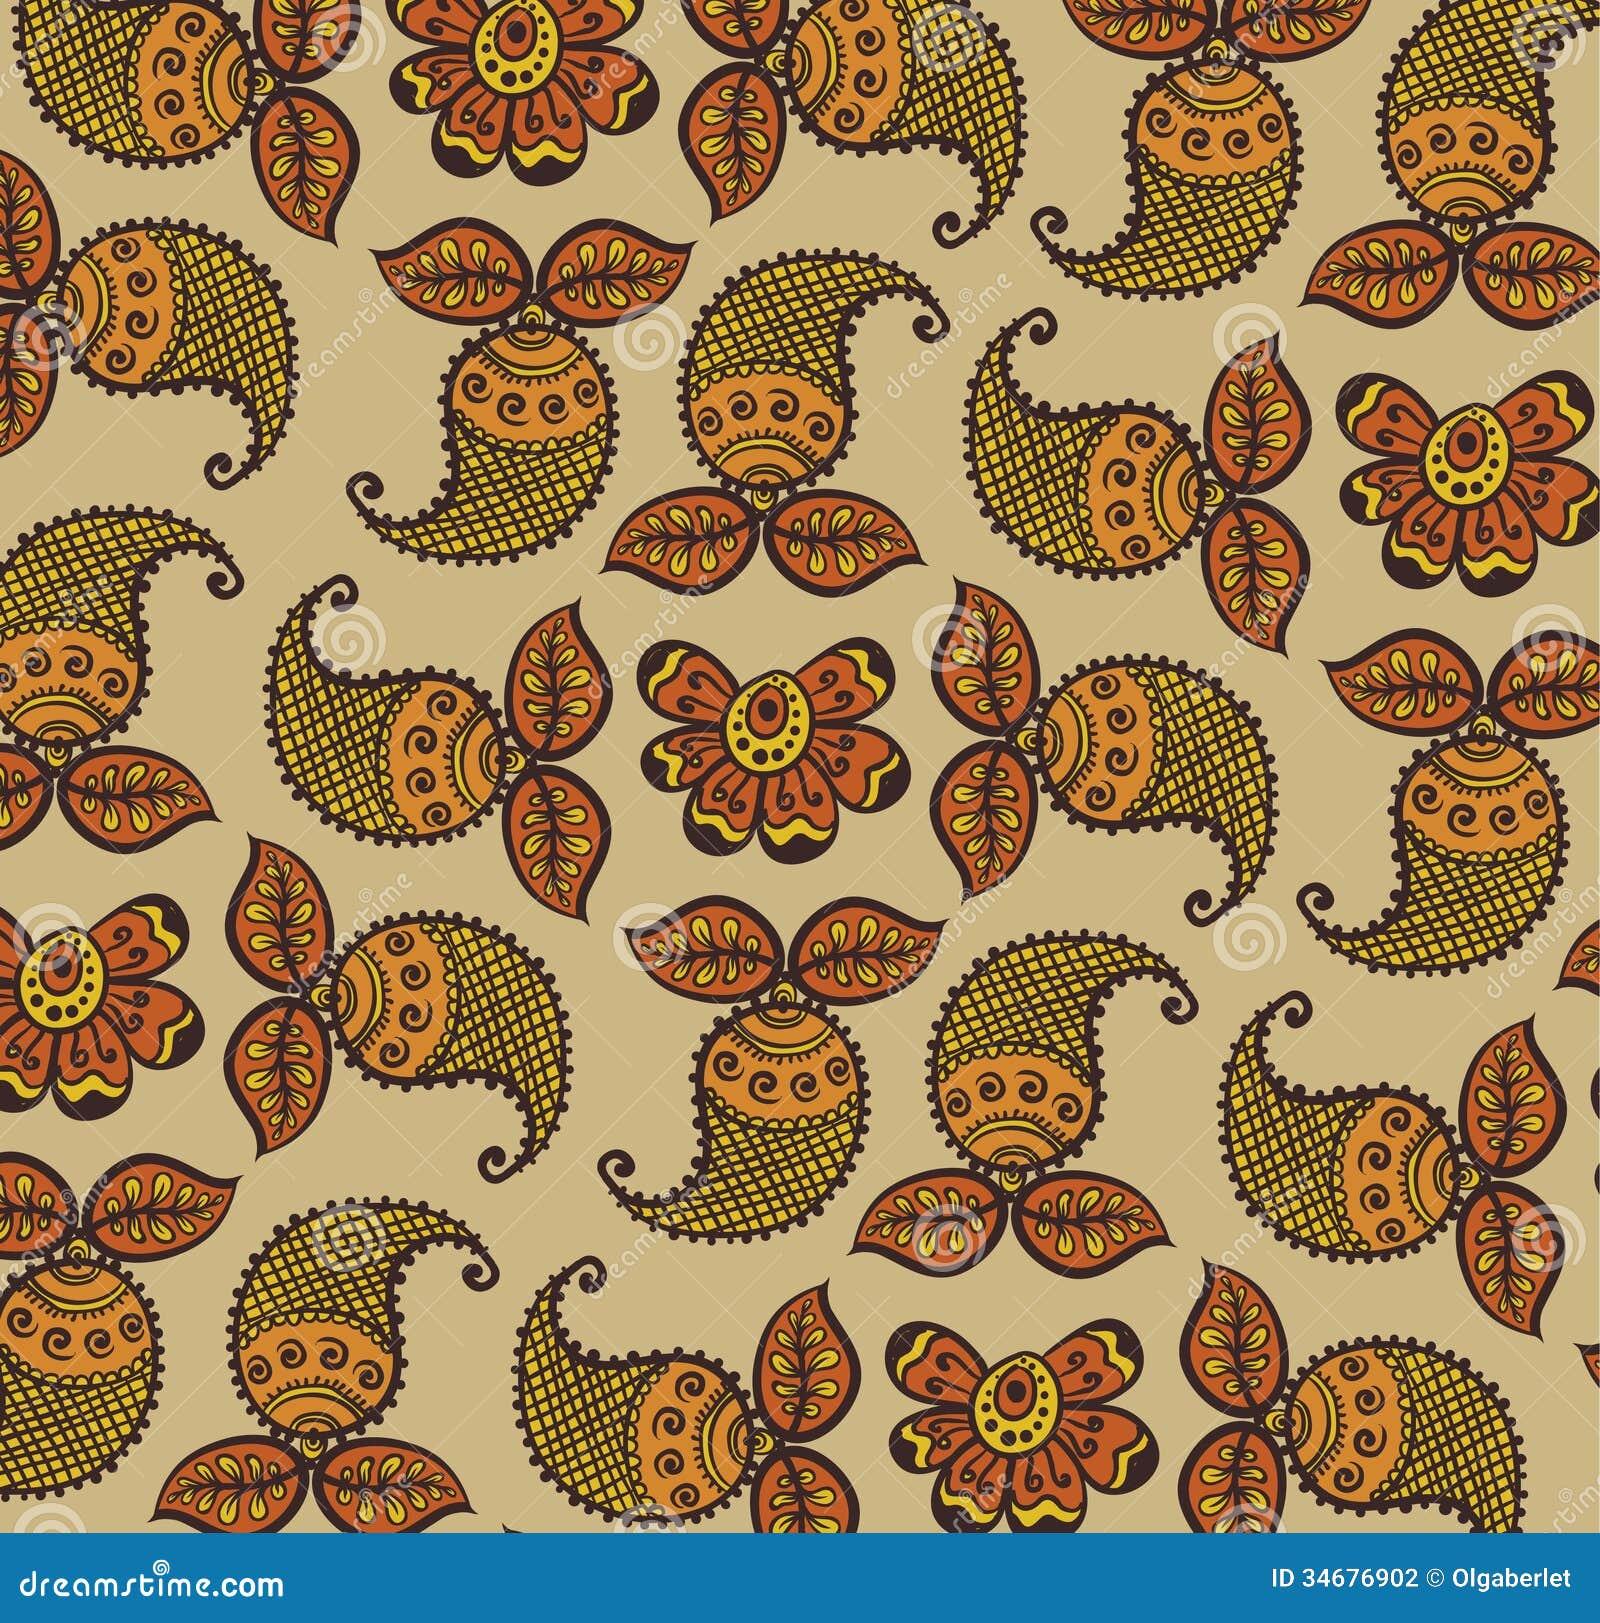 Henna Wallpaper: Floral Design Henna Stock Photography